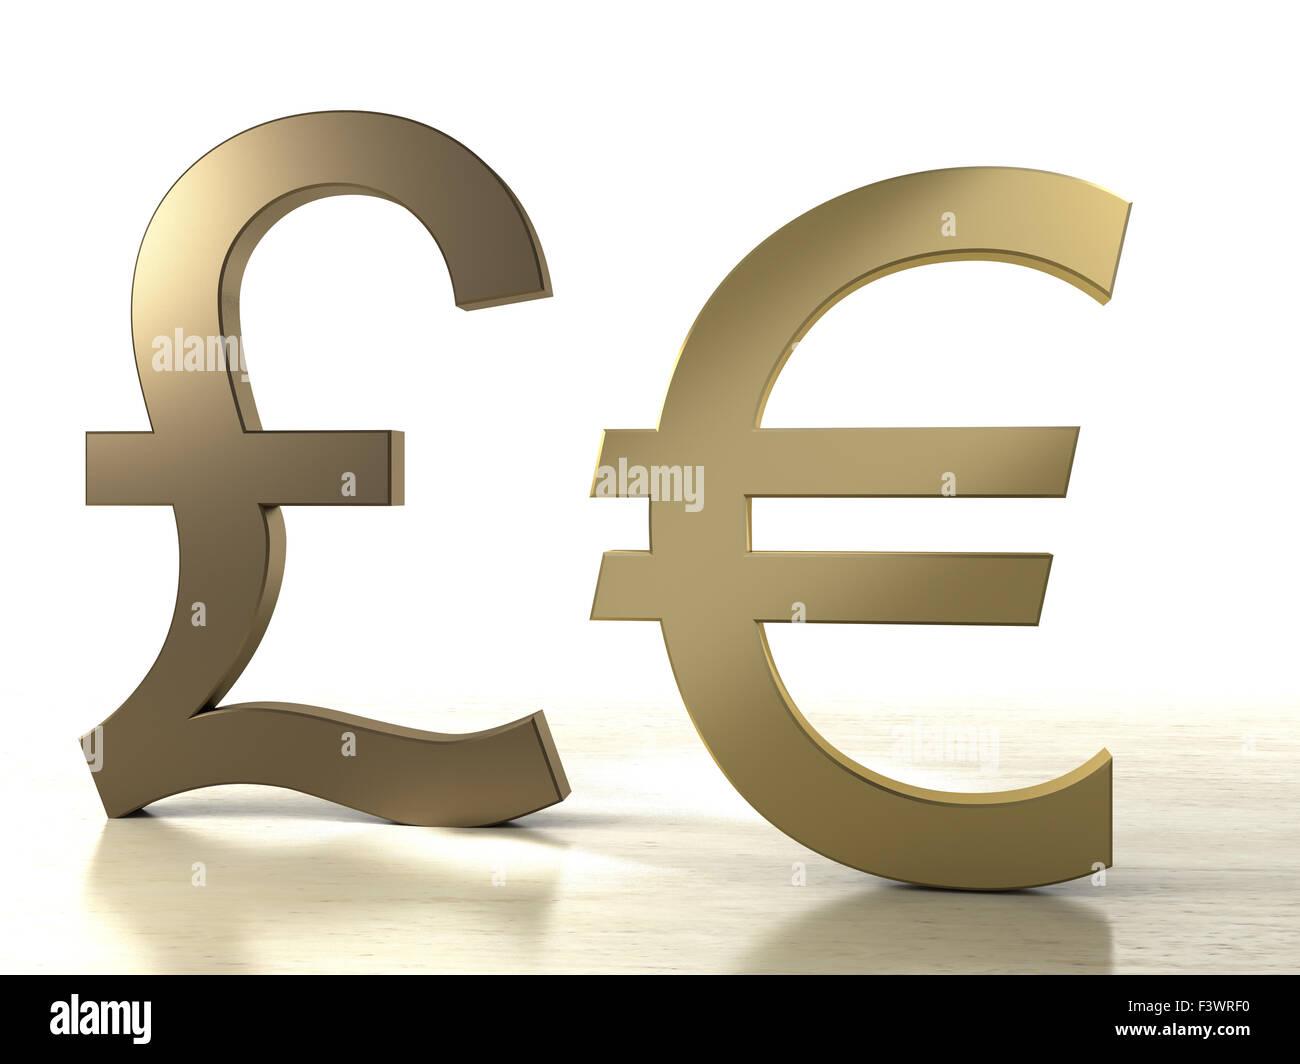 British Pound Currency Symbol